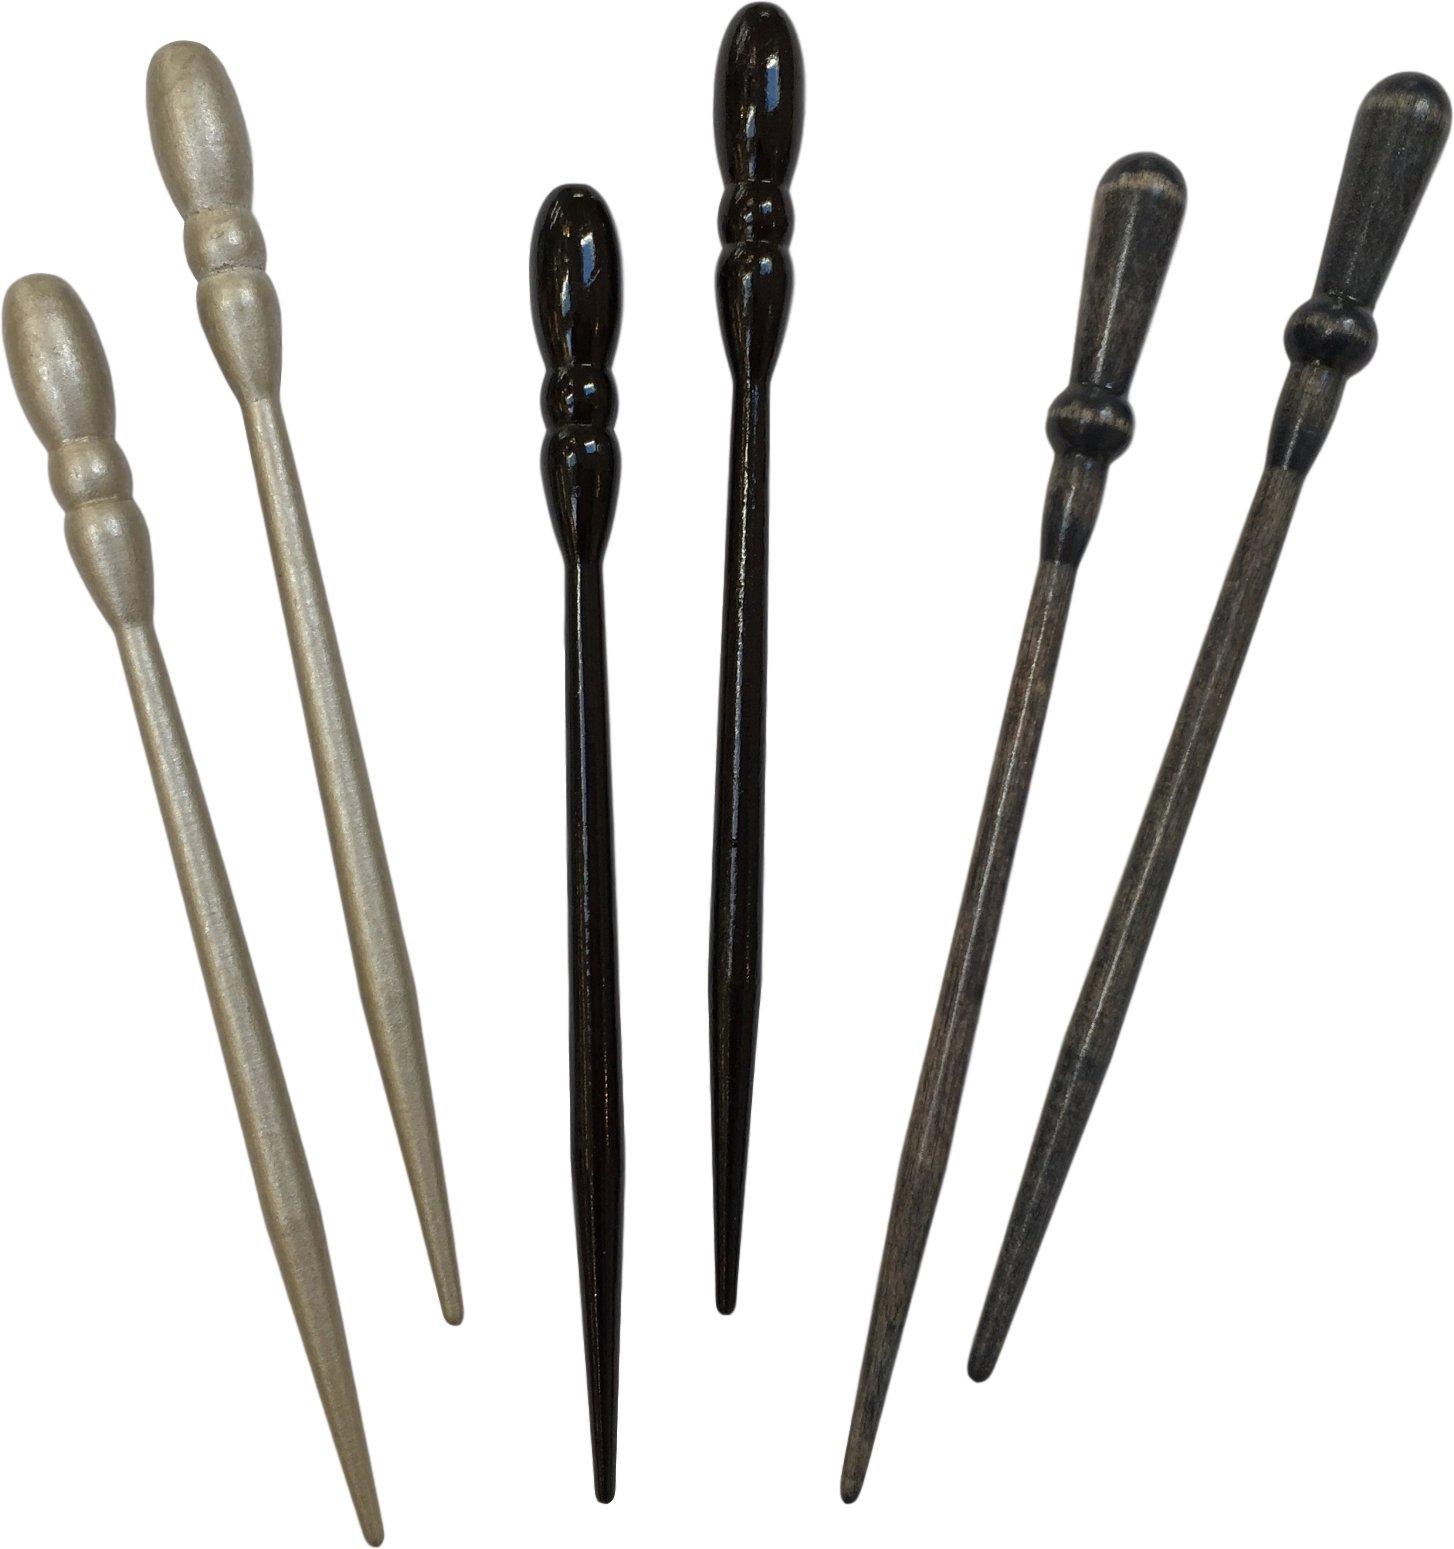 3 Pairs of Shaune Bazner ALLWOOD Hair Sticks (Silver/Black Onyx Glossy/Lapis) by Shaune Bazner